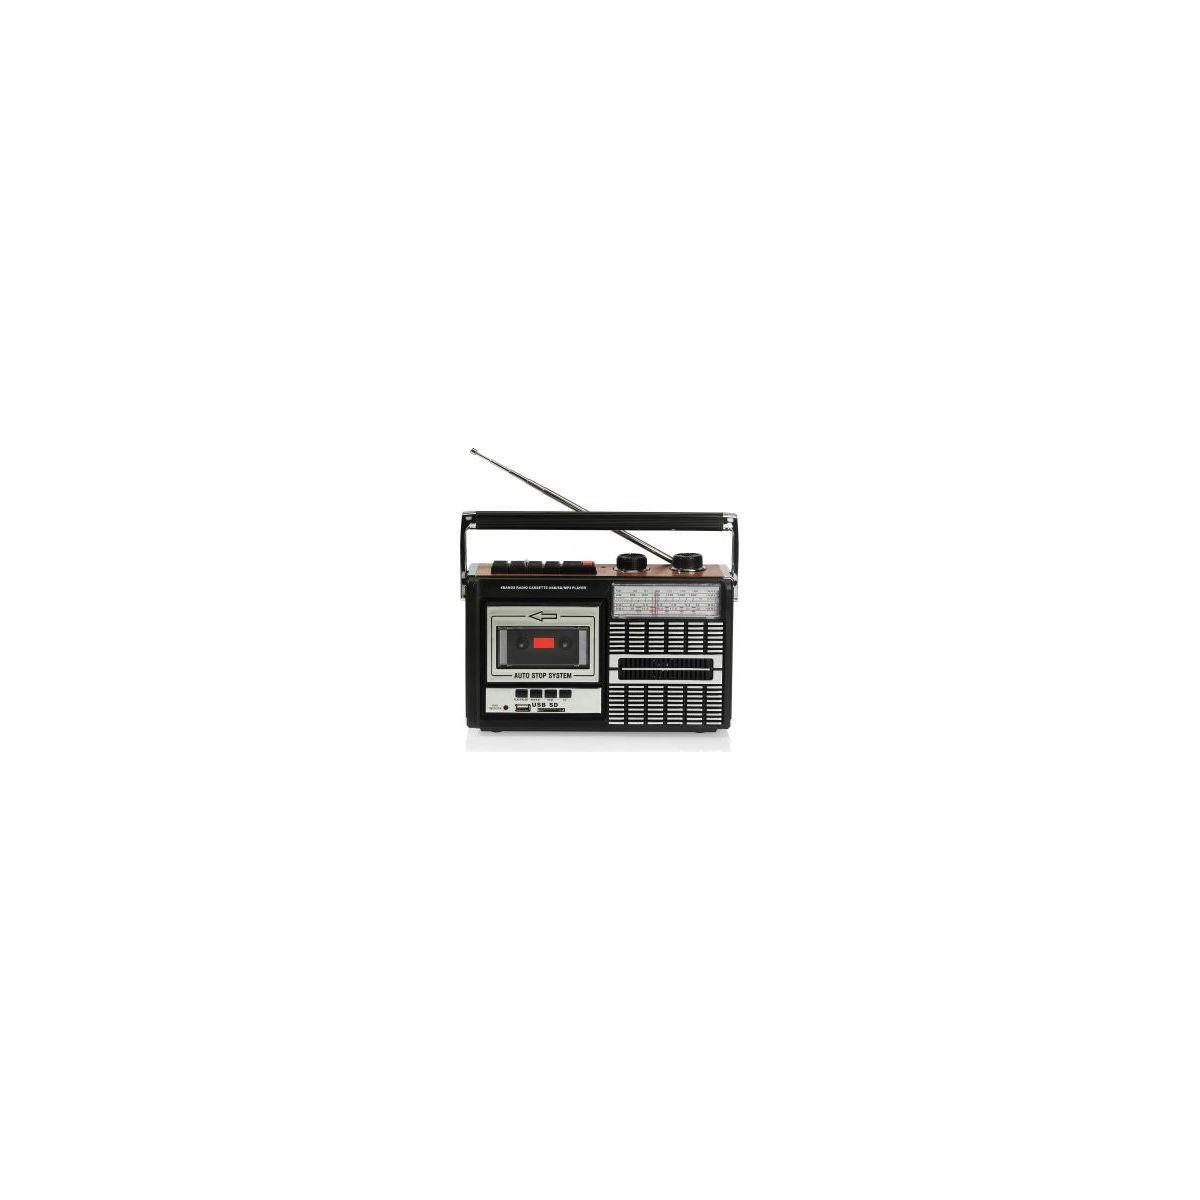 Radio analogique ricatech pr85 recorder 80's (photo)